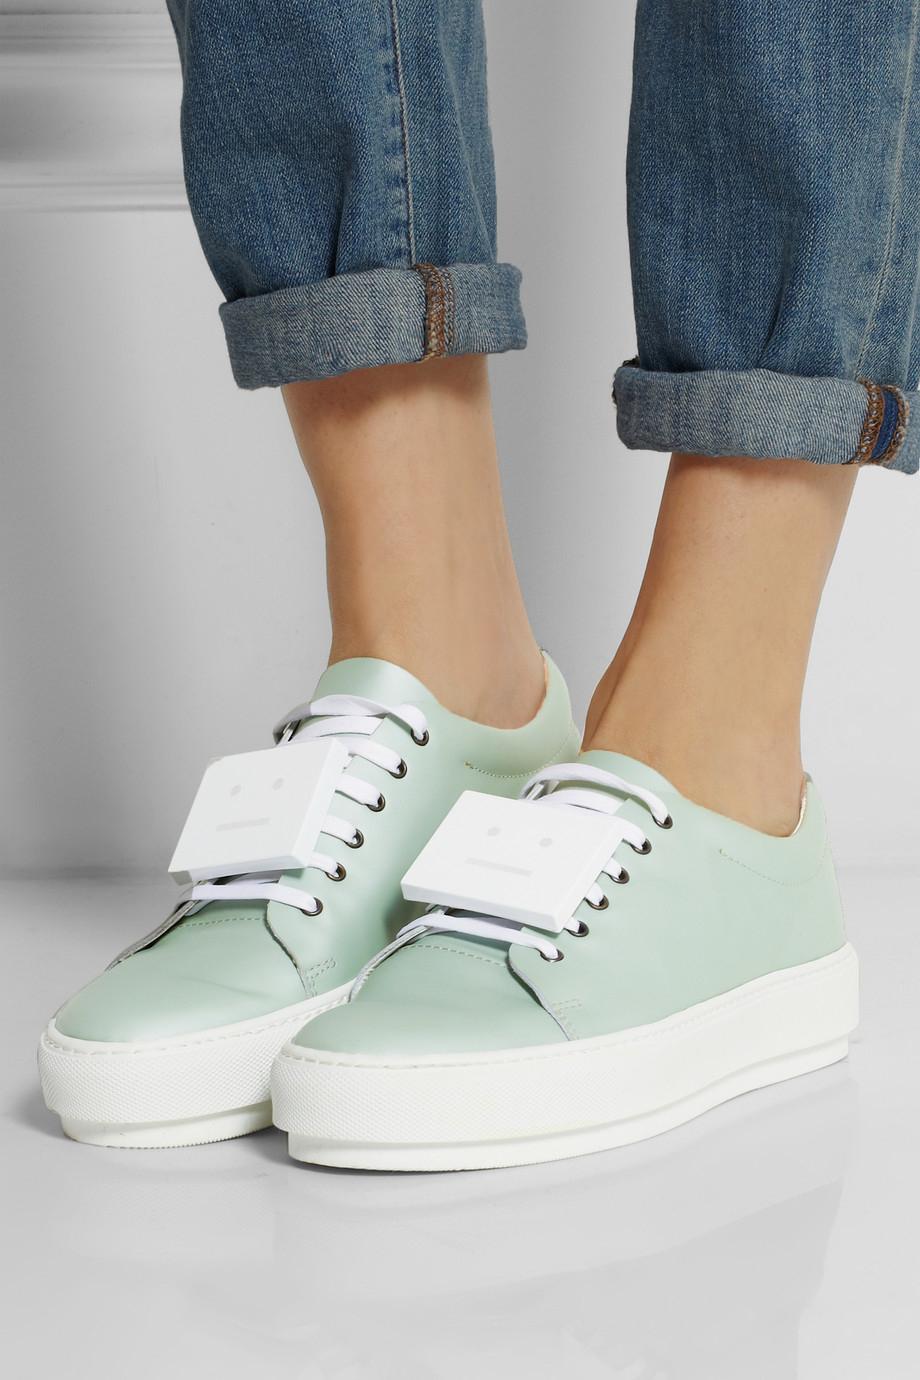 Acne Studios Shoes Sizing